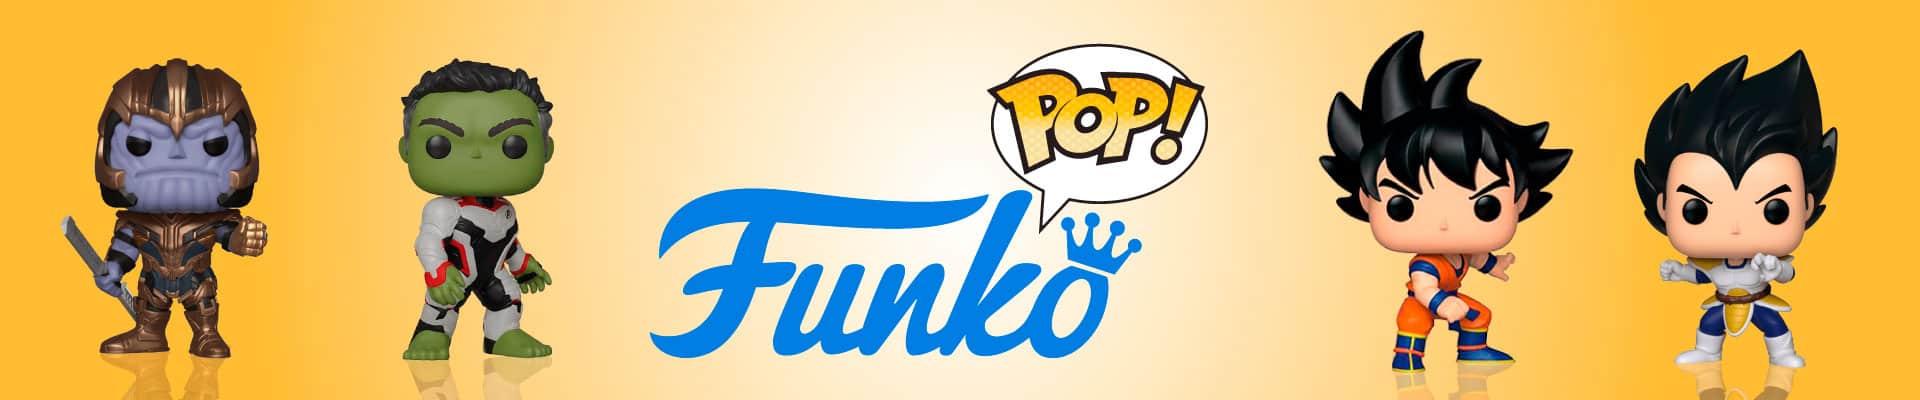 Funko Pop en Xtreme Play Colombia